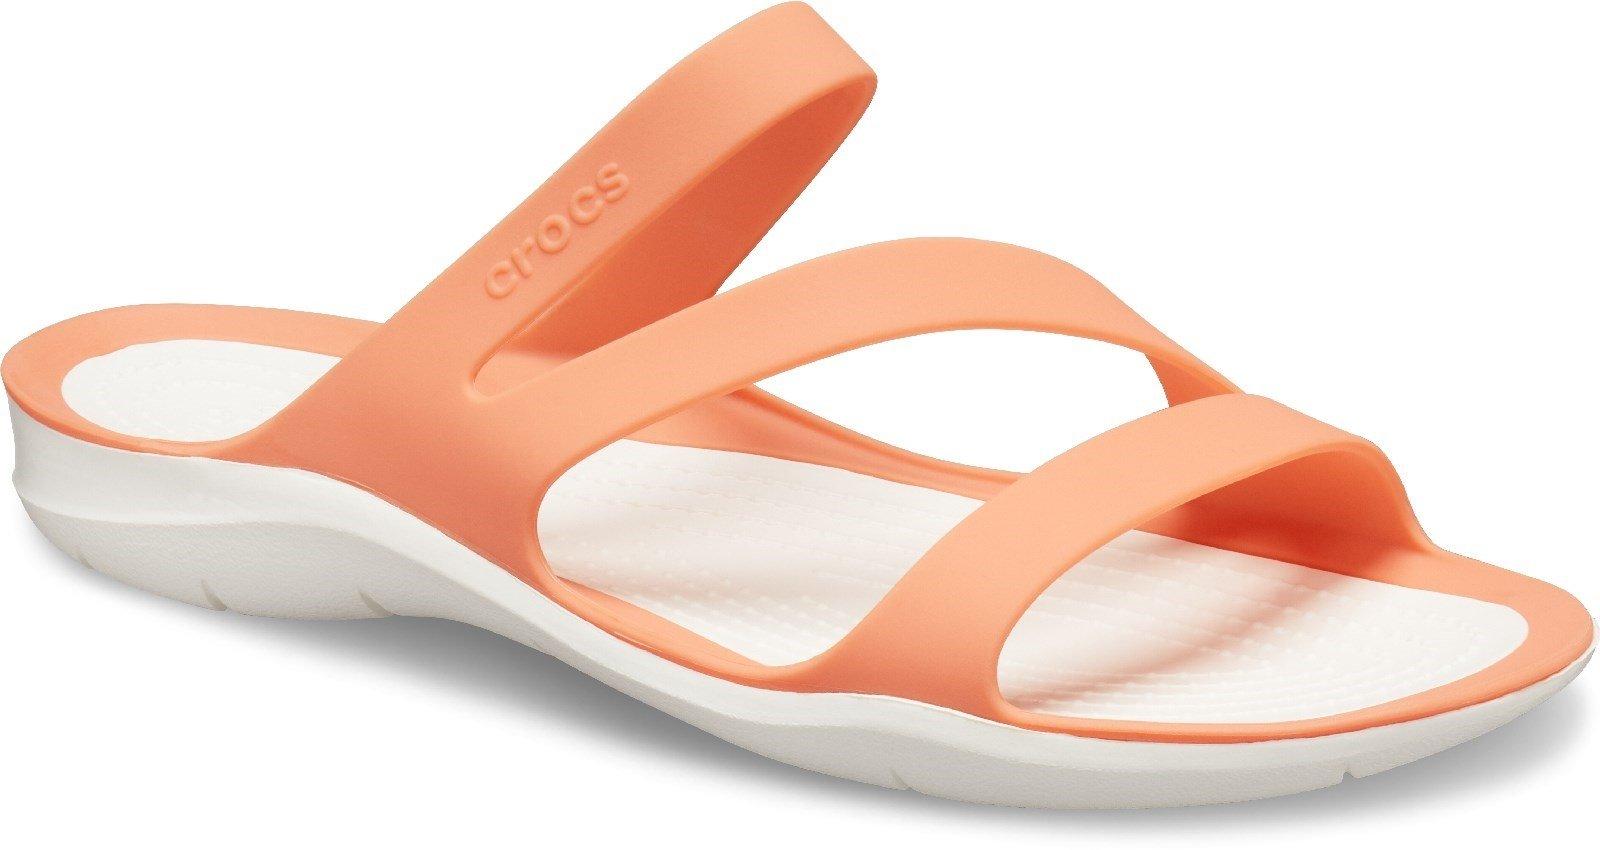 Crocs Women's Swiftwater Sandal Various Colours 25389 - Grapefruit/White 3